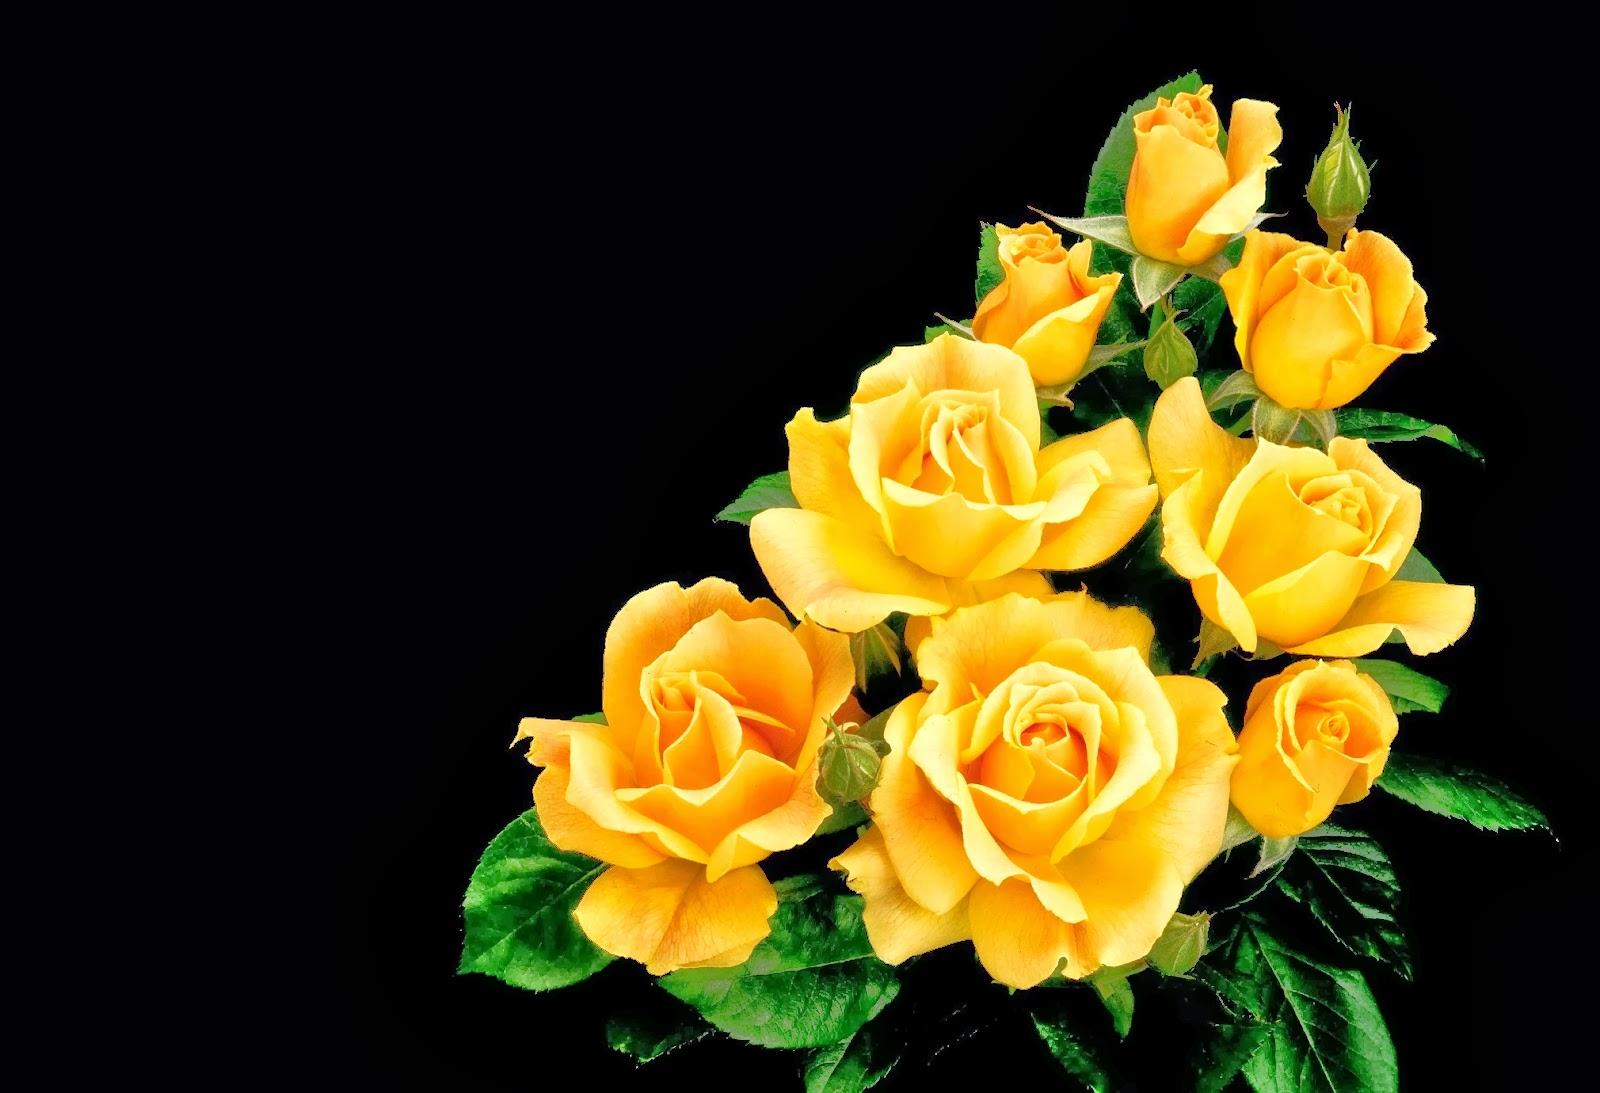 All 4u hd wallpaper free download beautiful yellow rose - Yellow rose images hd ...